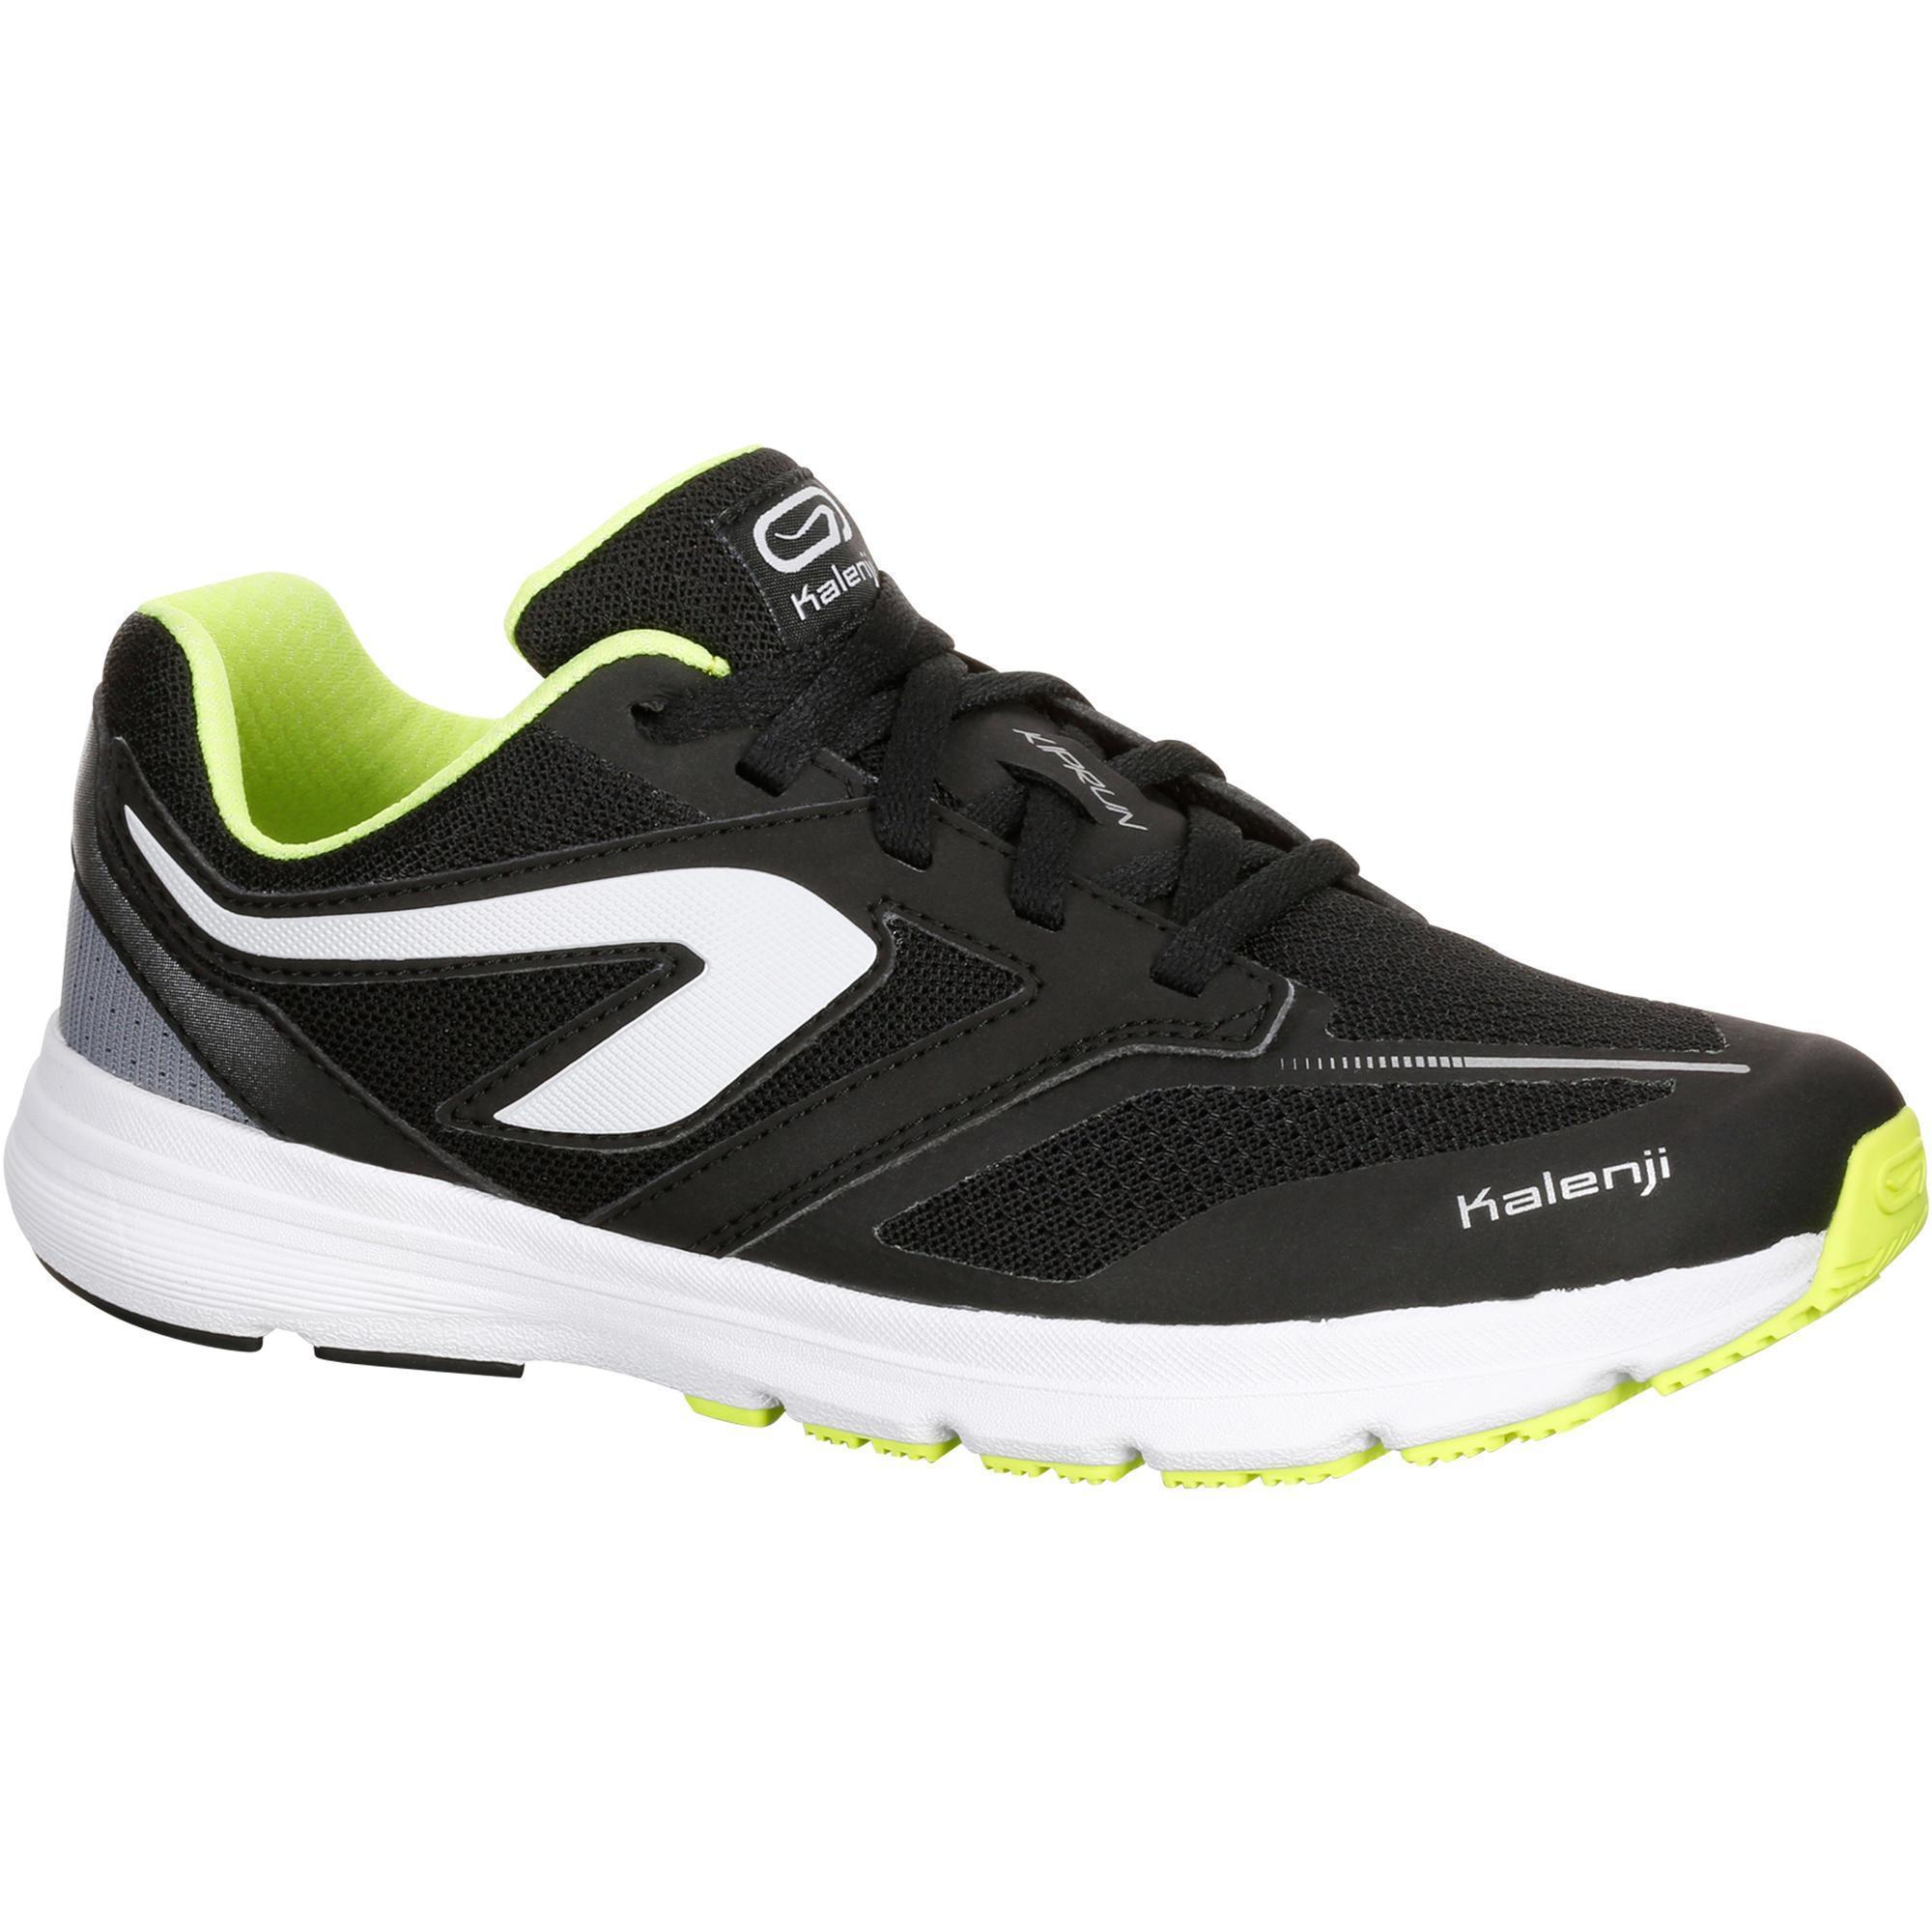 ee8785b6586564 scarpe atletica Online > Fino a 73% OFF Scontate